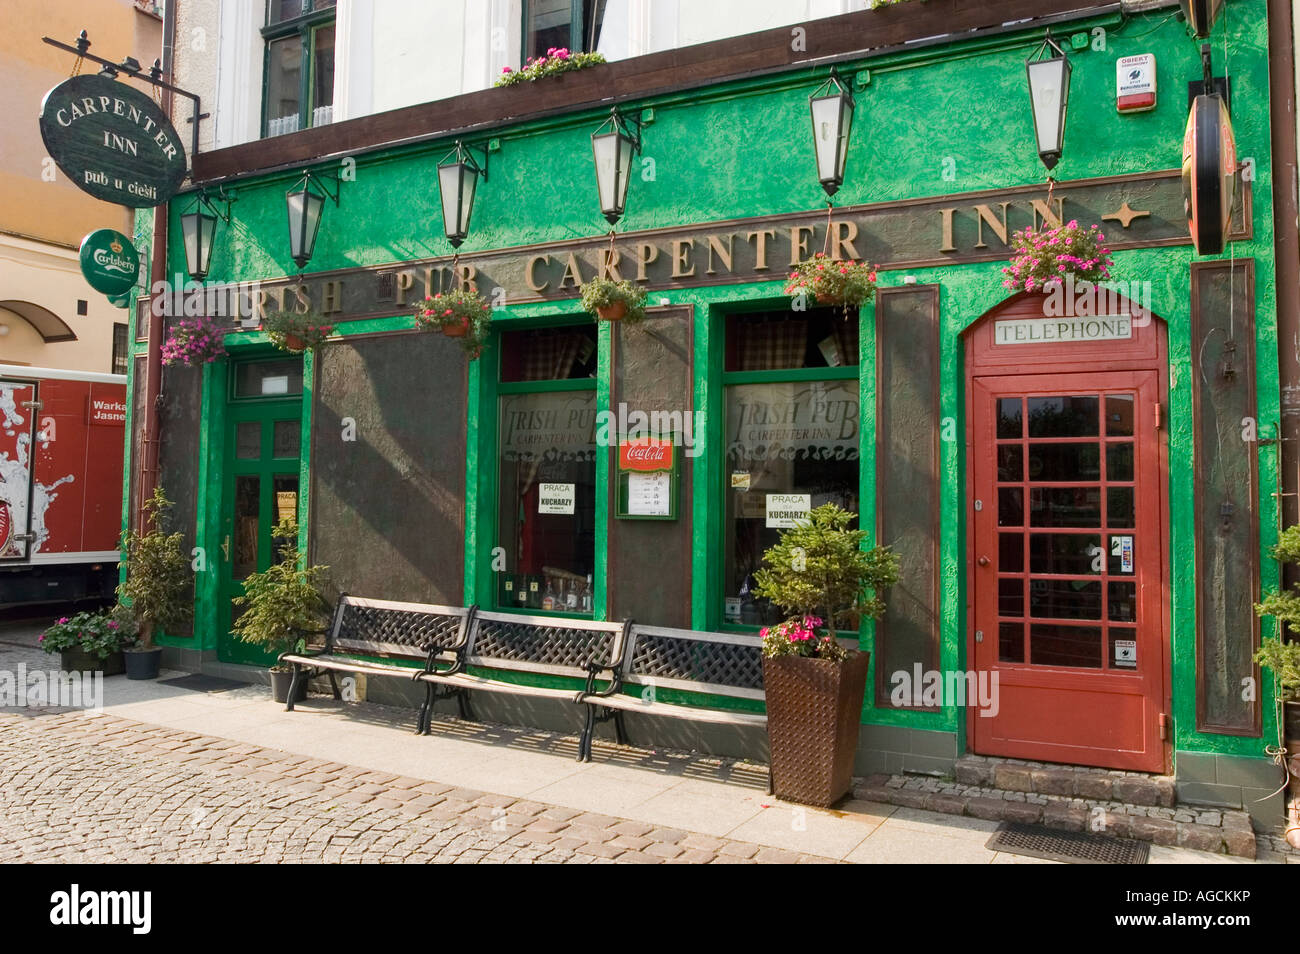 Green Irish Pub The Carpenter Inn in  Olsztyn Allenstein Masuria Poland - Stock Image